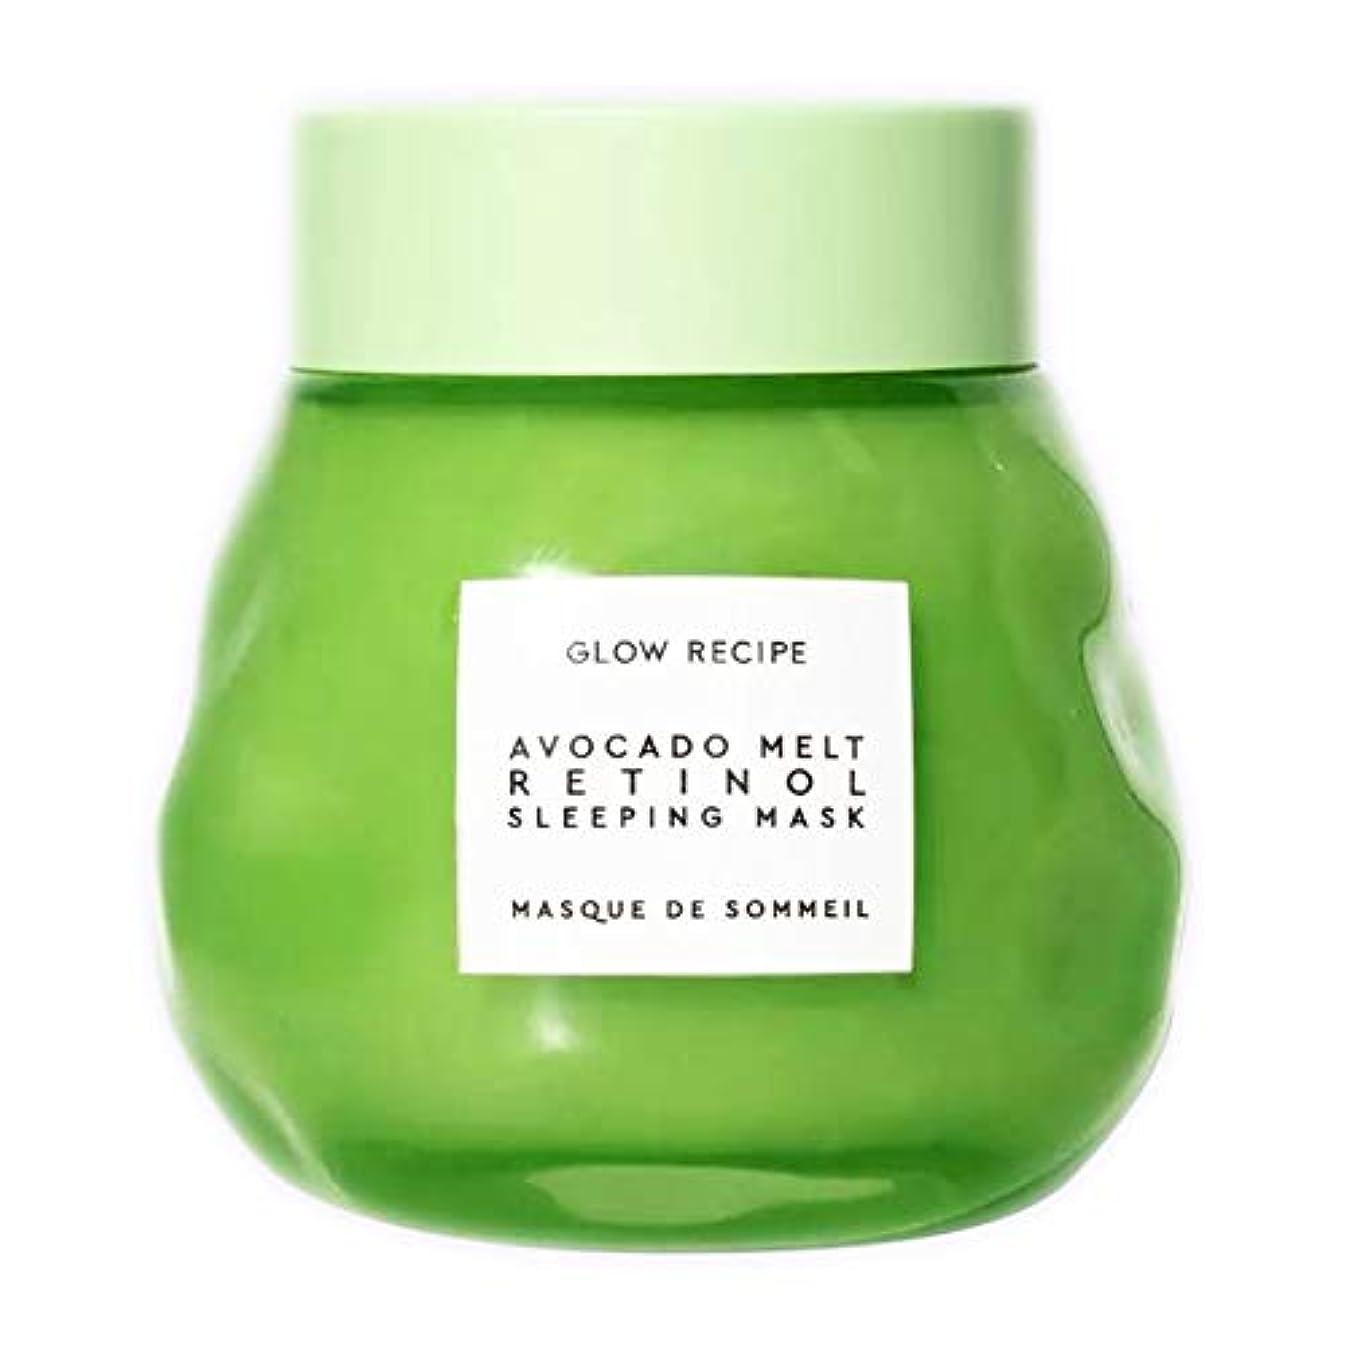 Glow Recipe Avocado Retinol Sleeping Mask 70ml